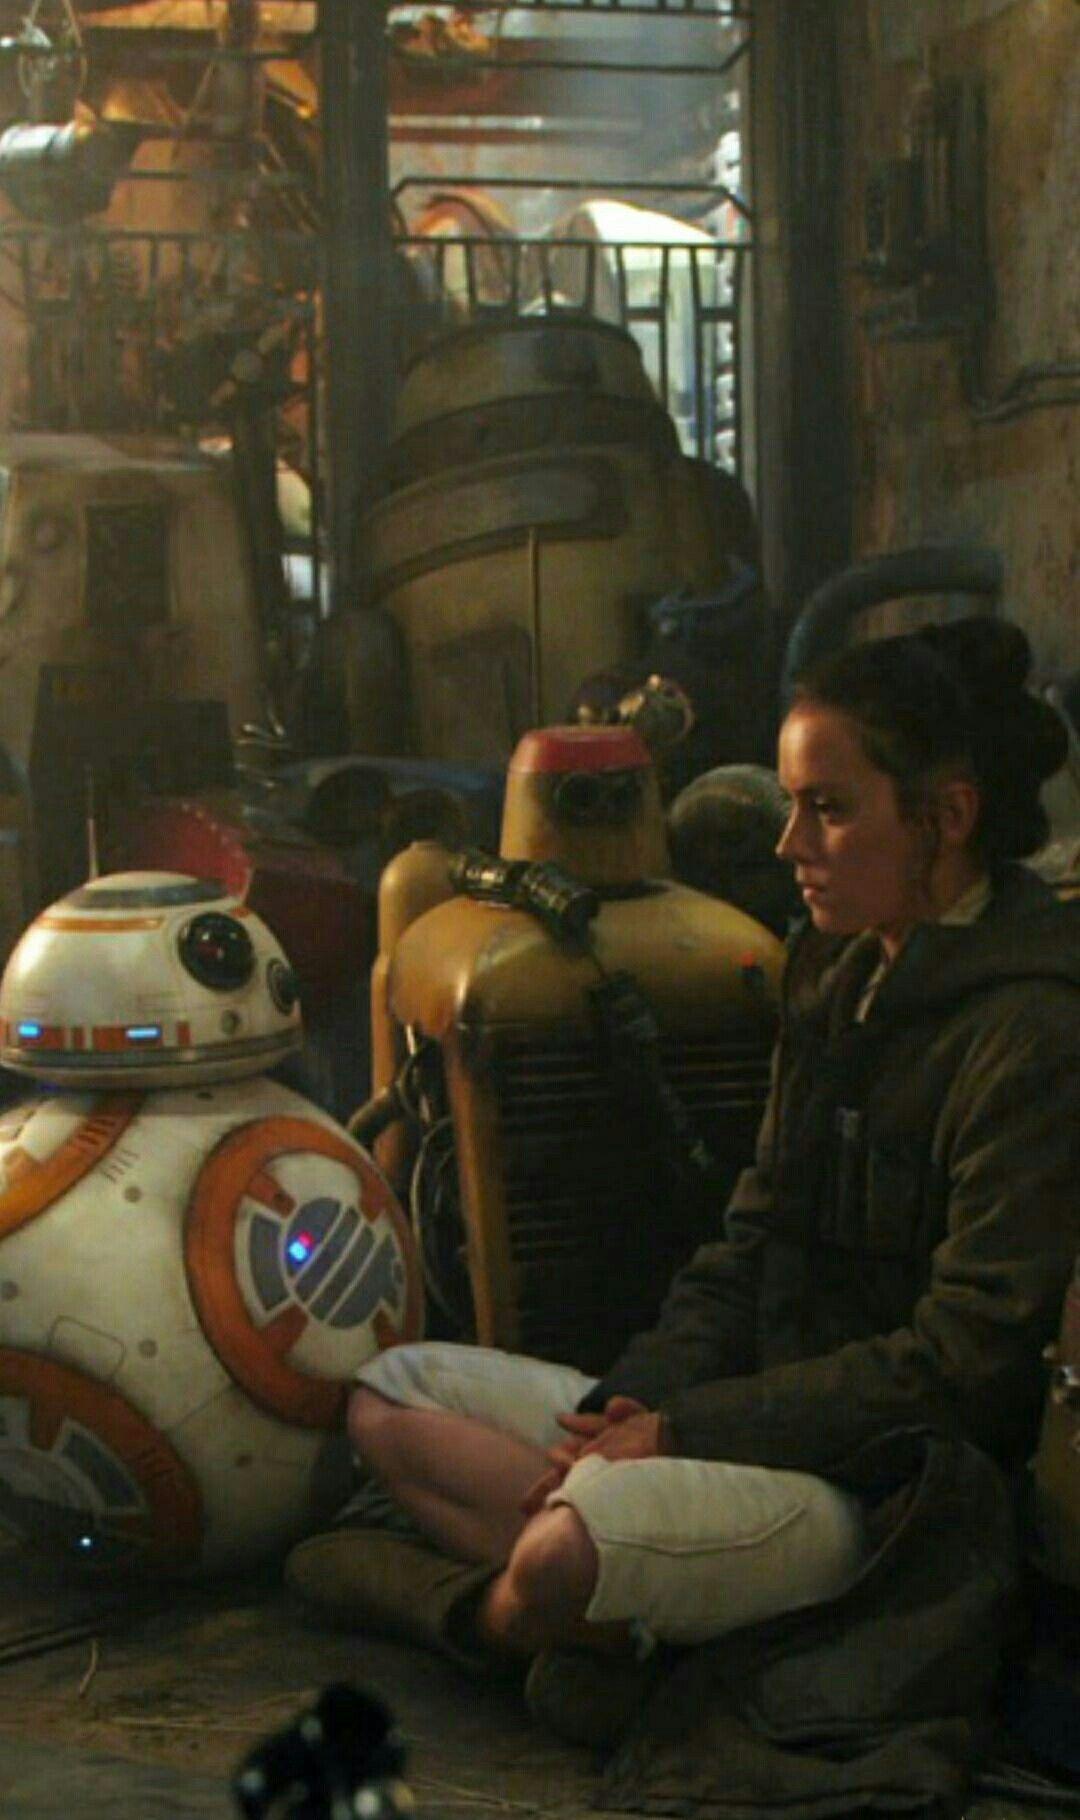 Photo of Rey & BB-8 amigos #rey #starwars #theriseofskywalker